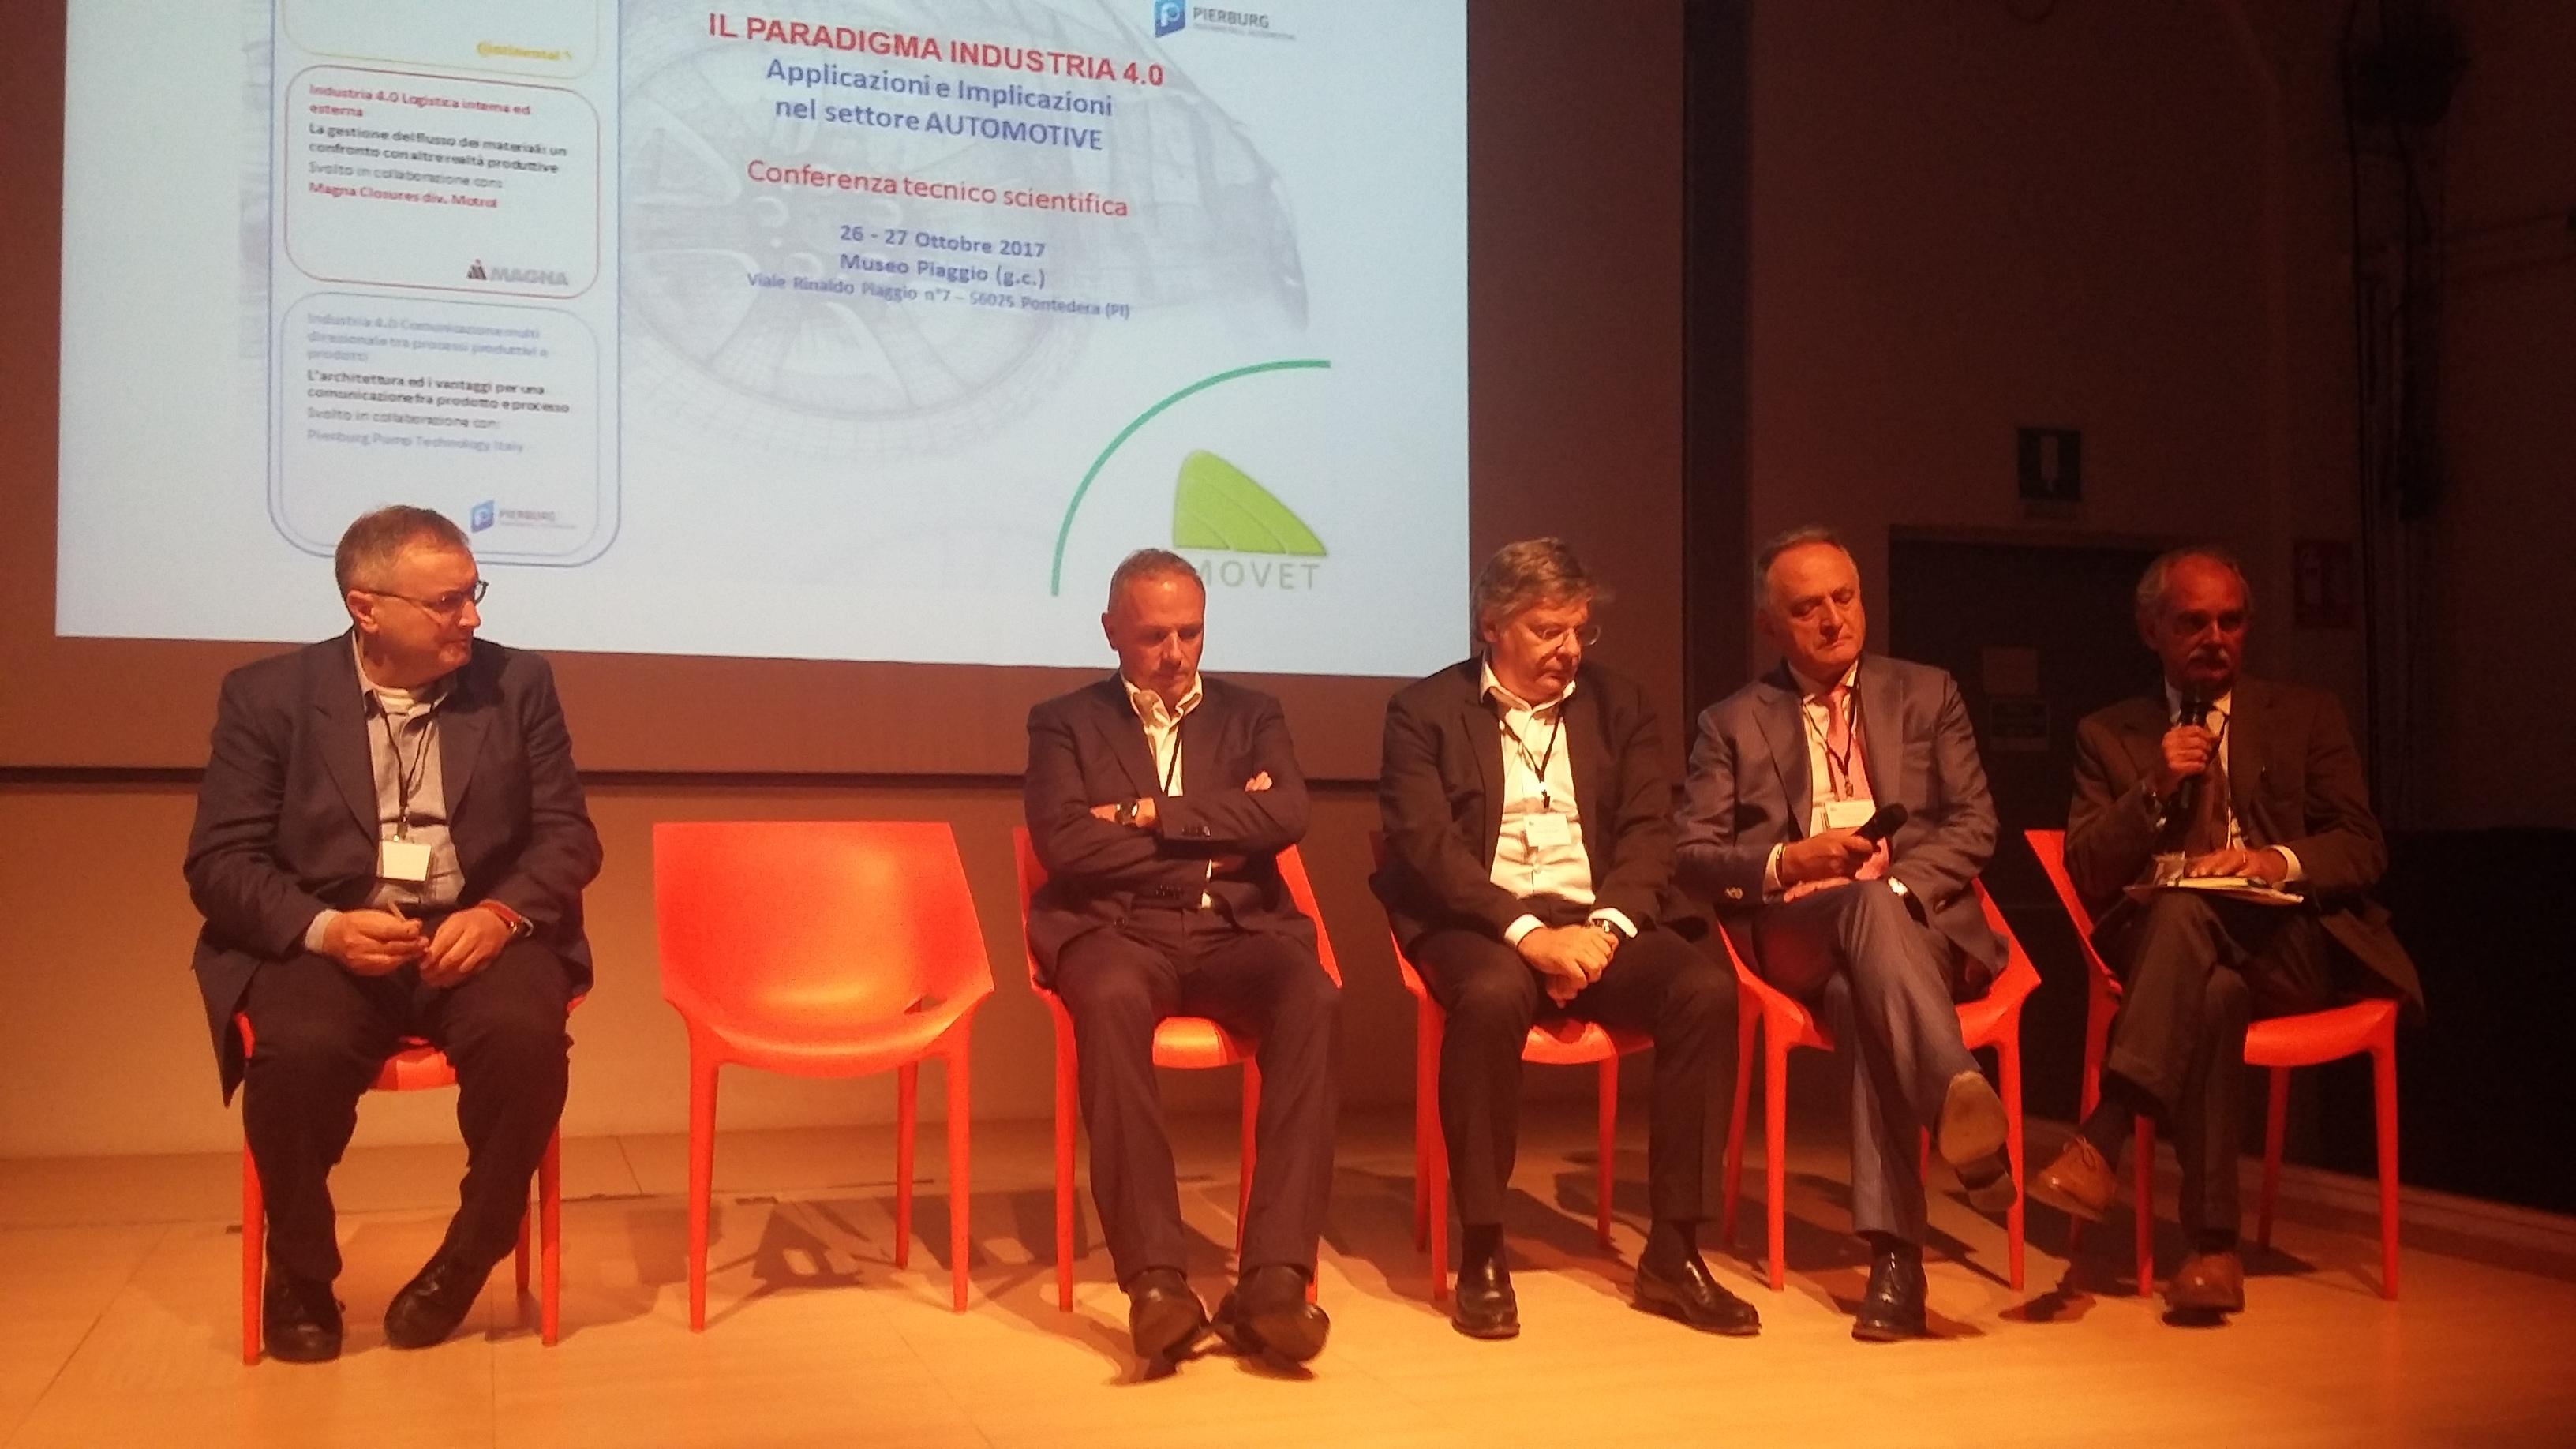 Industria 4.0: le imprese automotive investano sul capitale umano